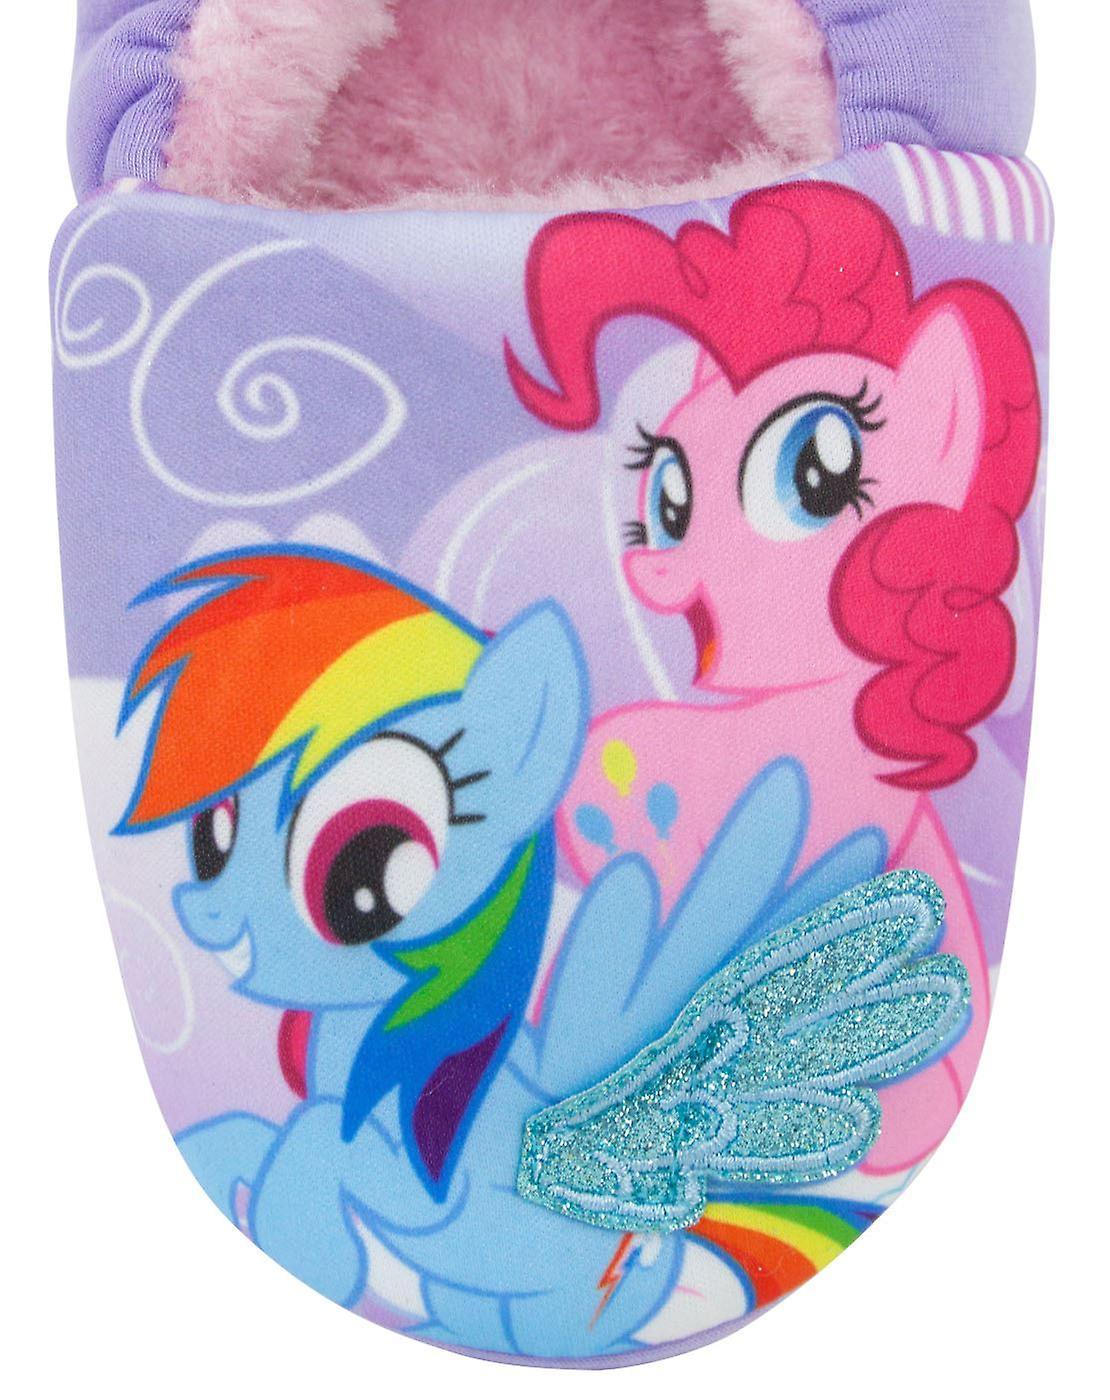 My Little Pony Pony Pals Purple Girl's Slippers - Gratis verzending Vy3exP